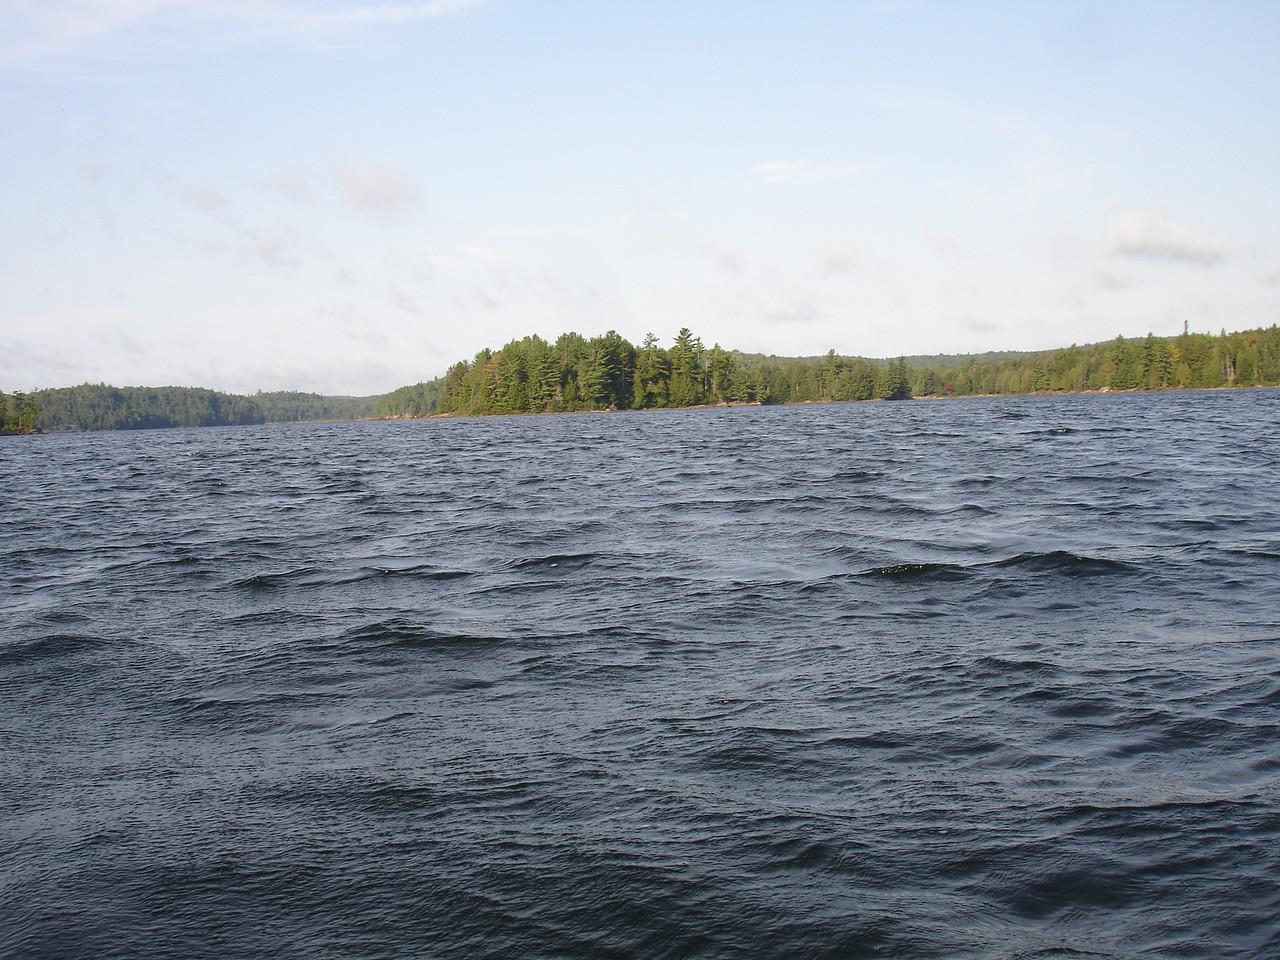 Looking back southwestward on Lake Louisa.